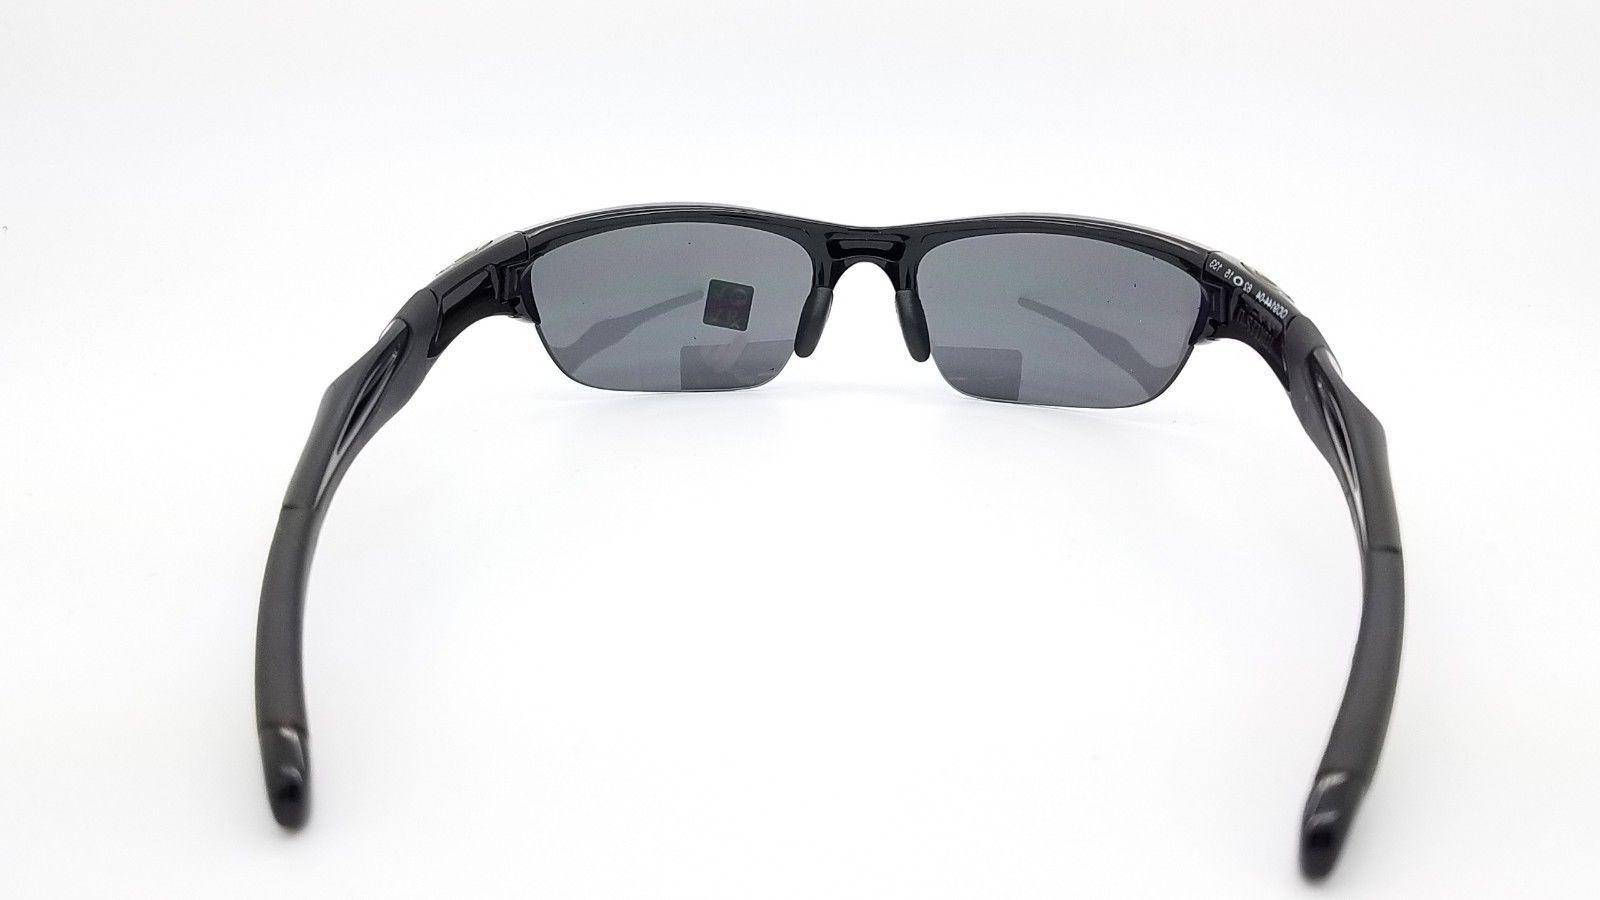 NEW Half 2.0 sunglasses Black Polarized AUTHENTIC